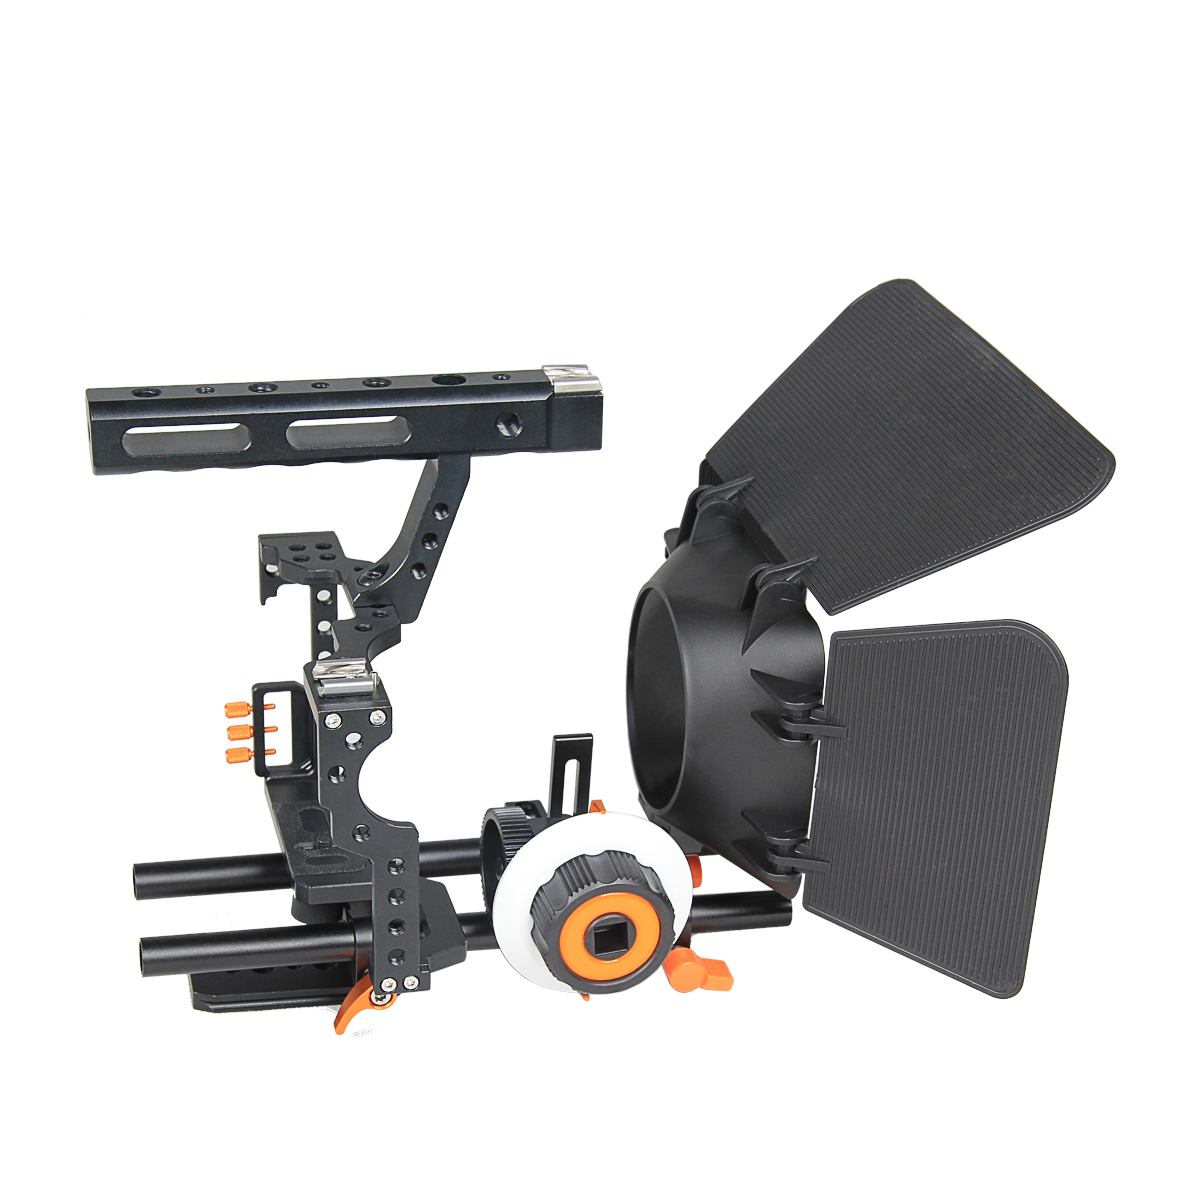 YELANGU Popular DSLR Camera Cage Shoulder Mount Rig Kit C500 Contain Follow Focus Matte Box